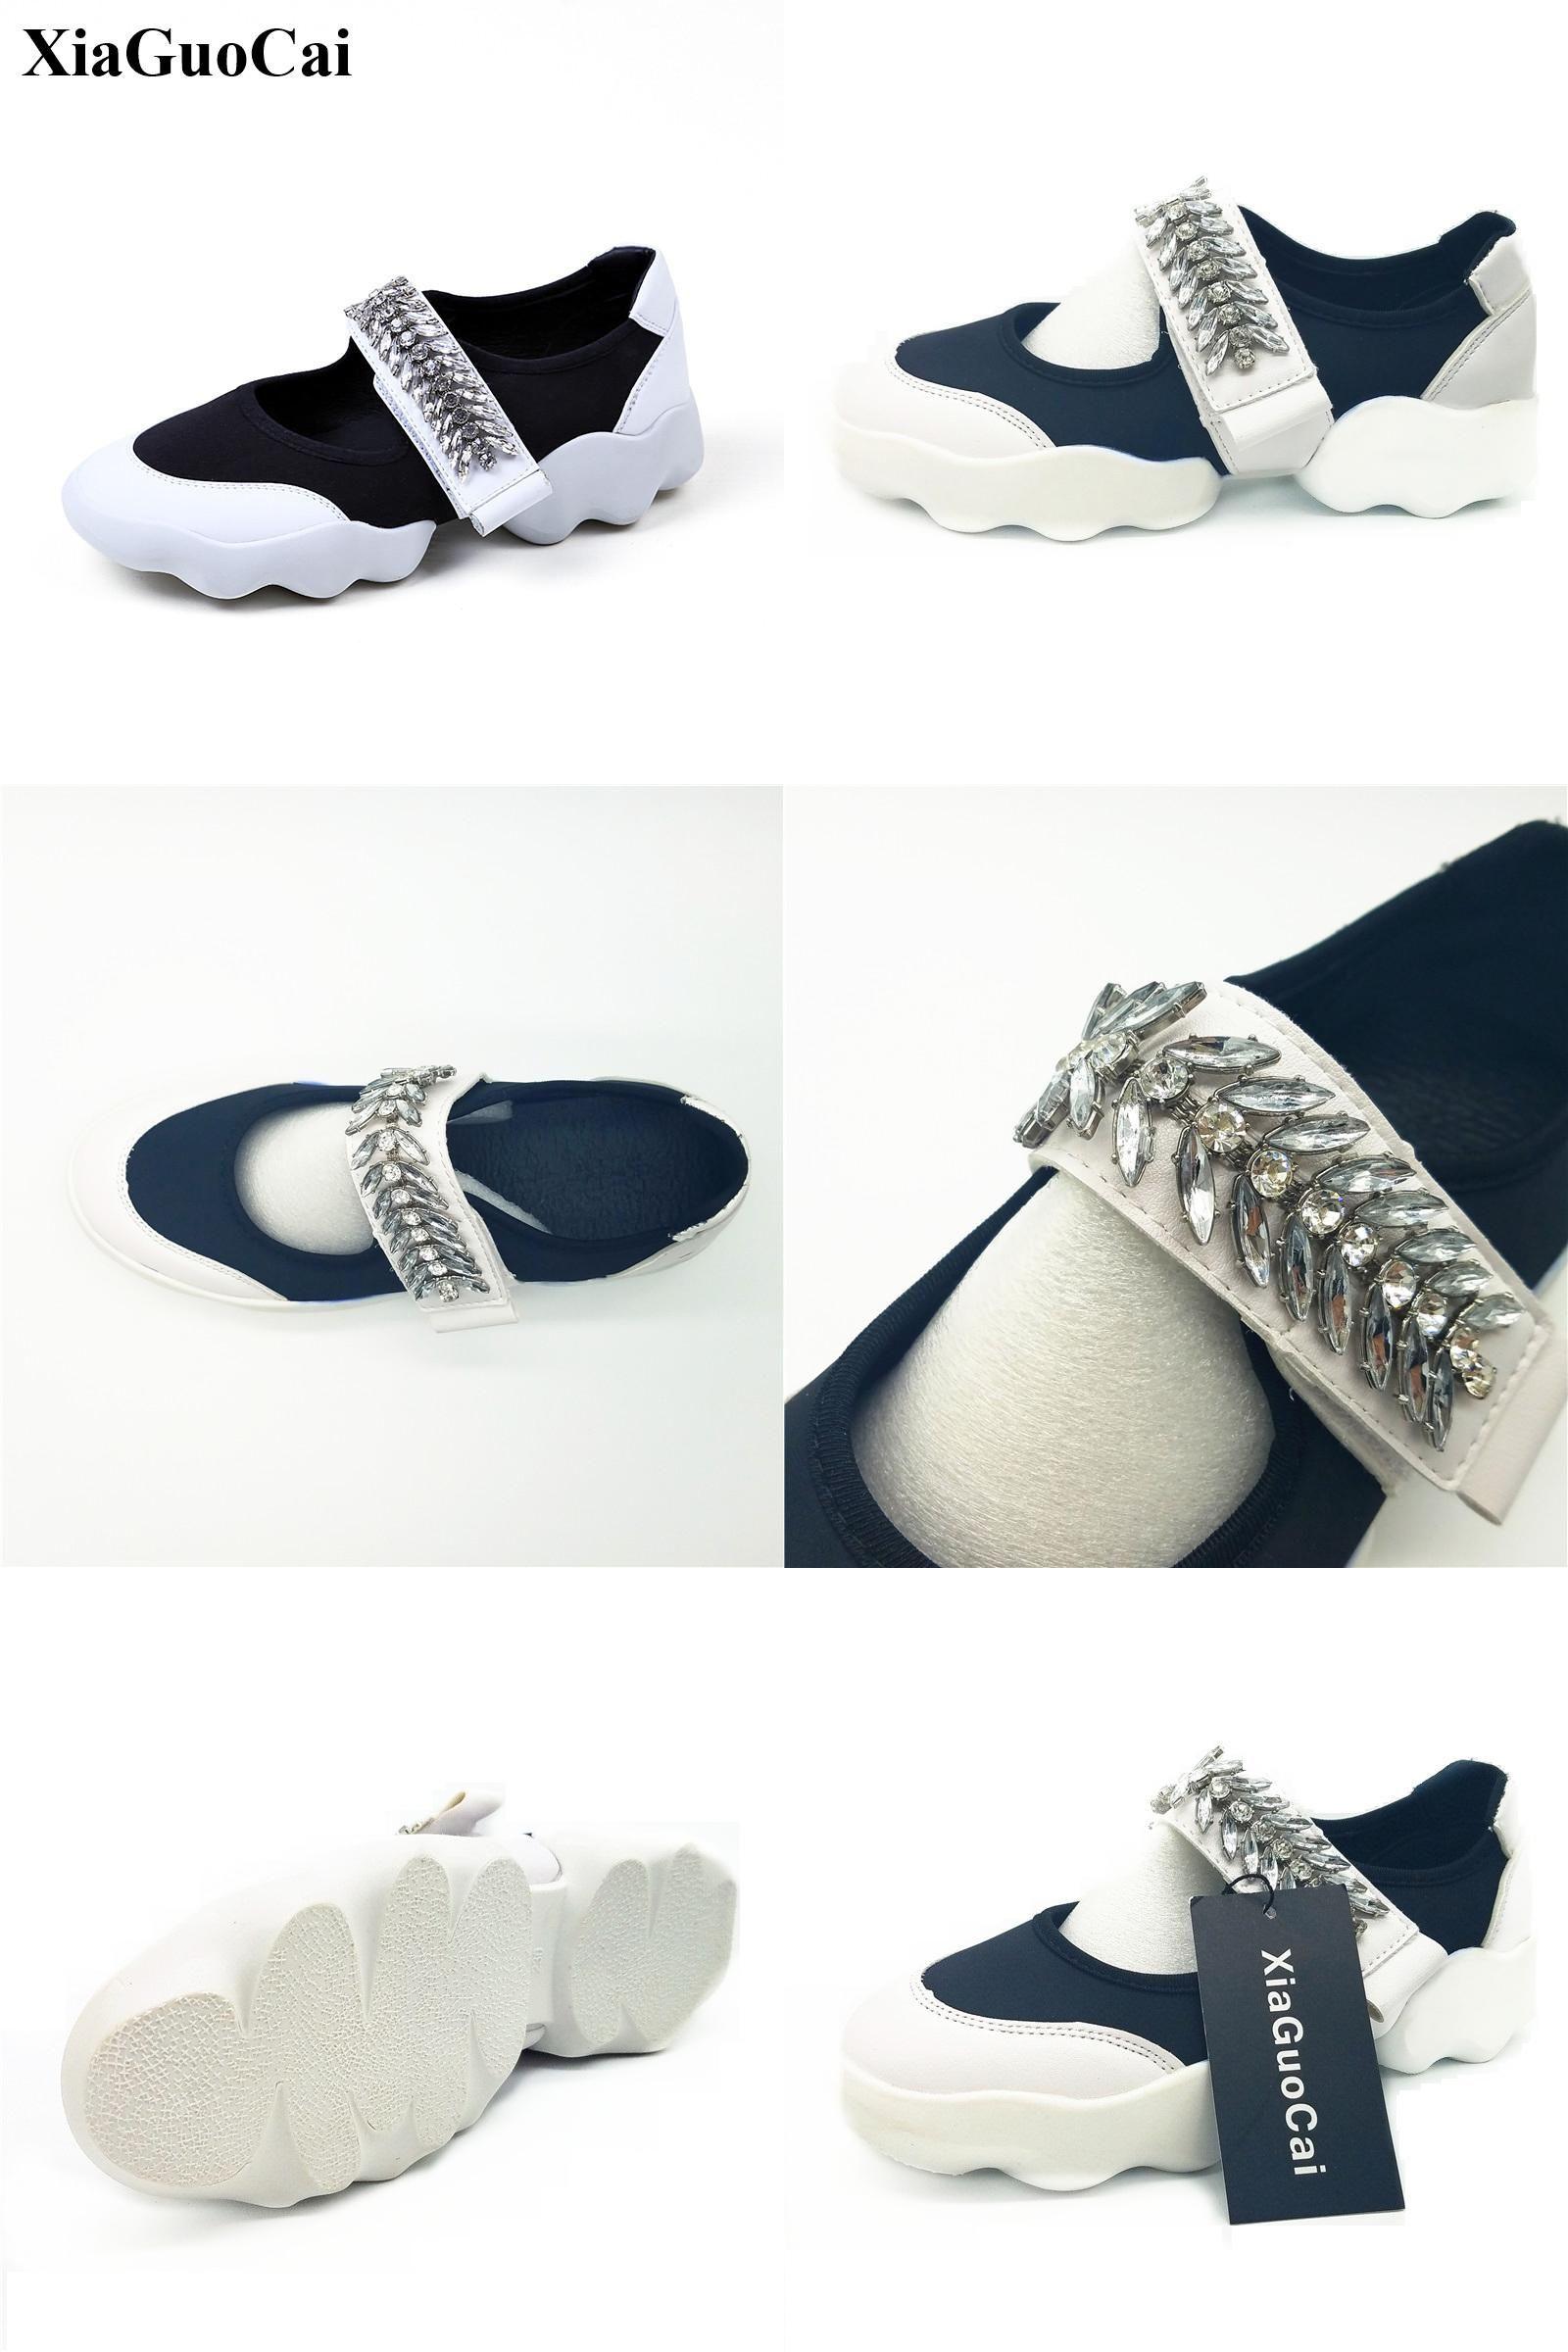 [Visit to Buy] Summer Women Shoes Fashion Shallow Platform Crystal Hook&loop Elastic Causal Flats Shoes Non-slip Walking Single Shoes H343 35 #Advertisement